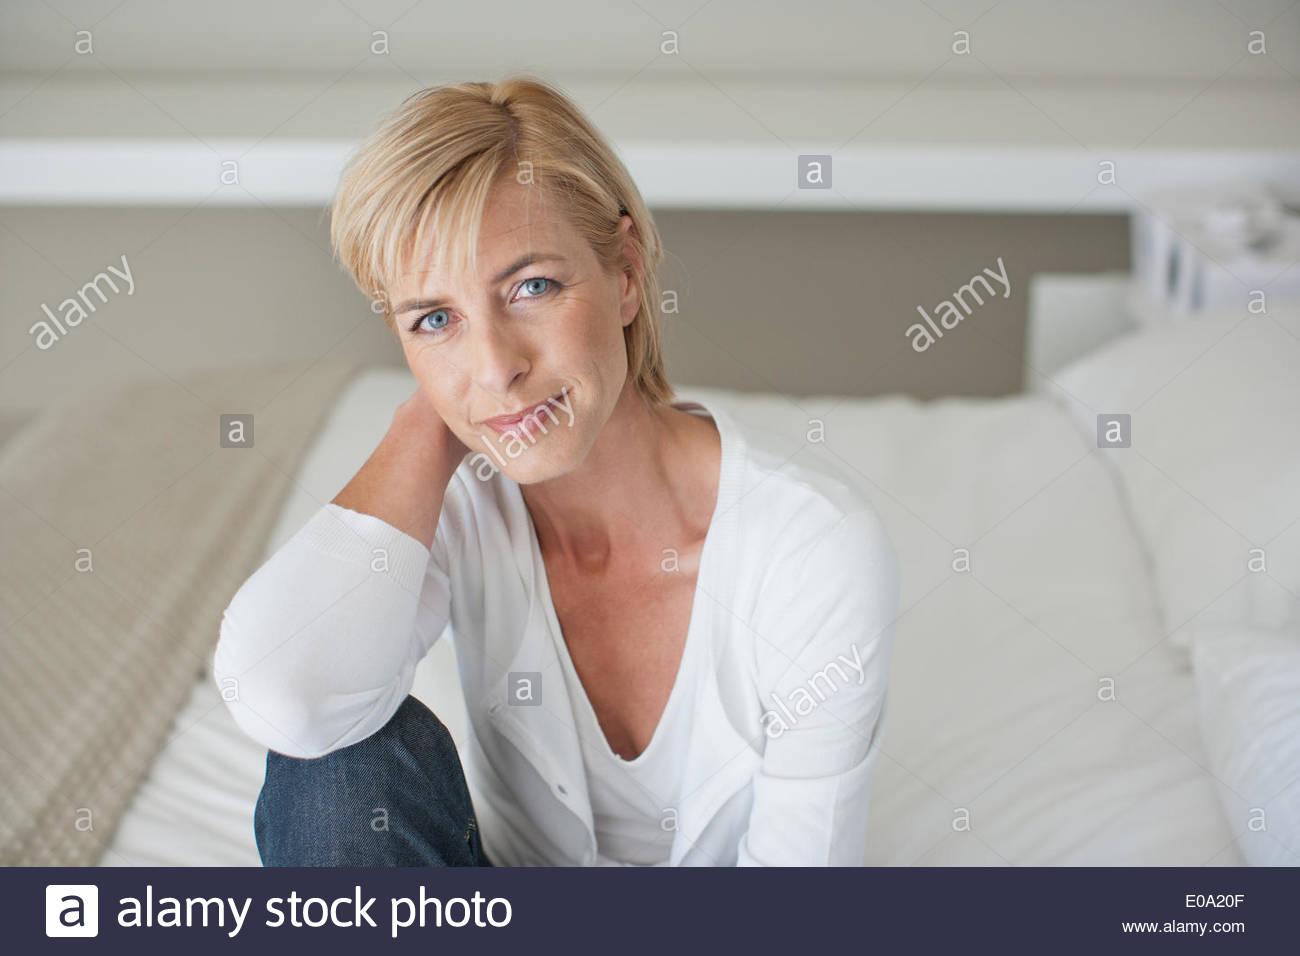 Mature woman - Stock Image